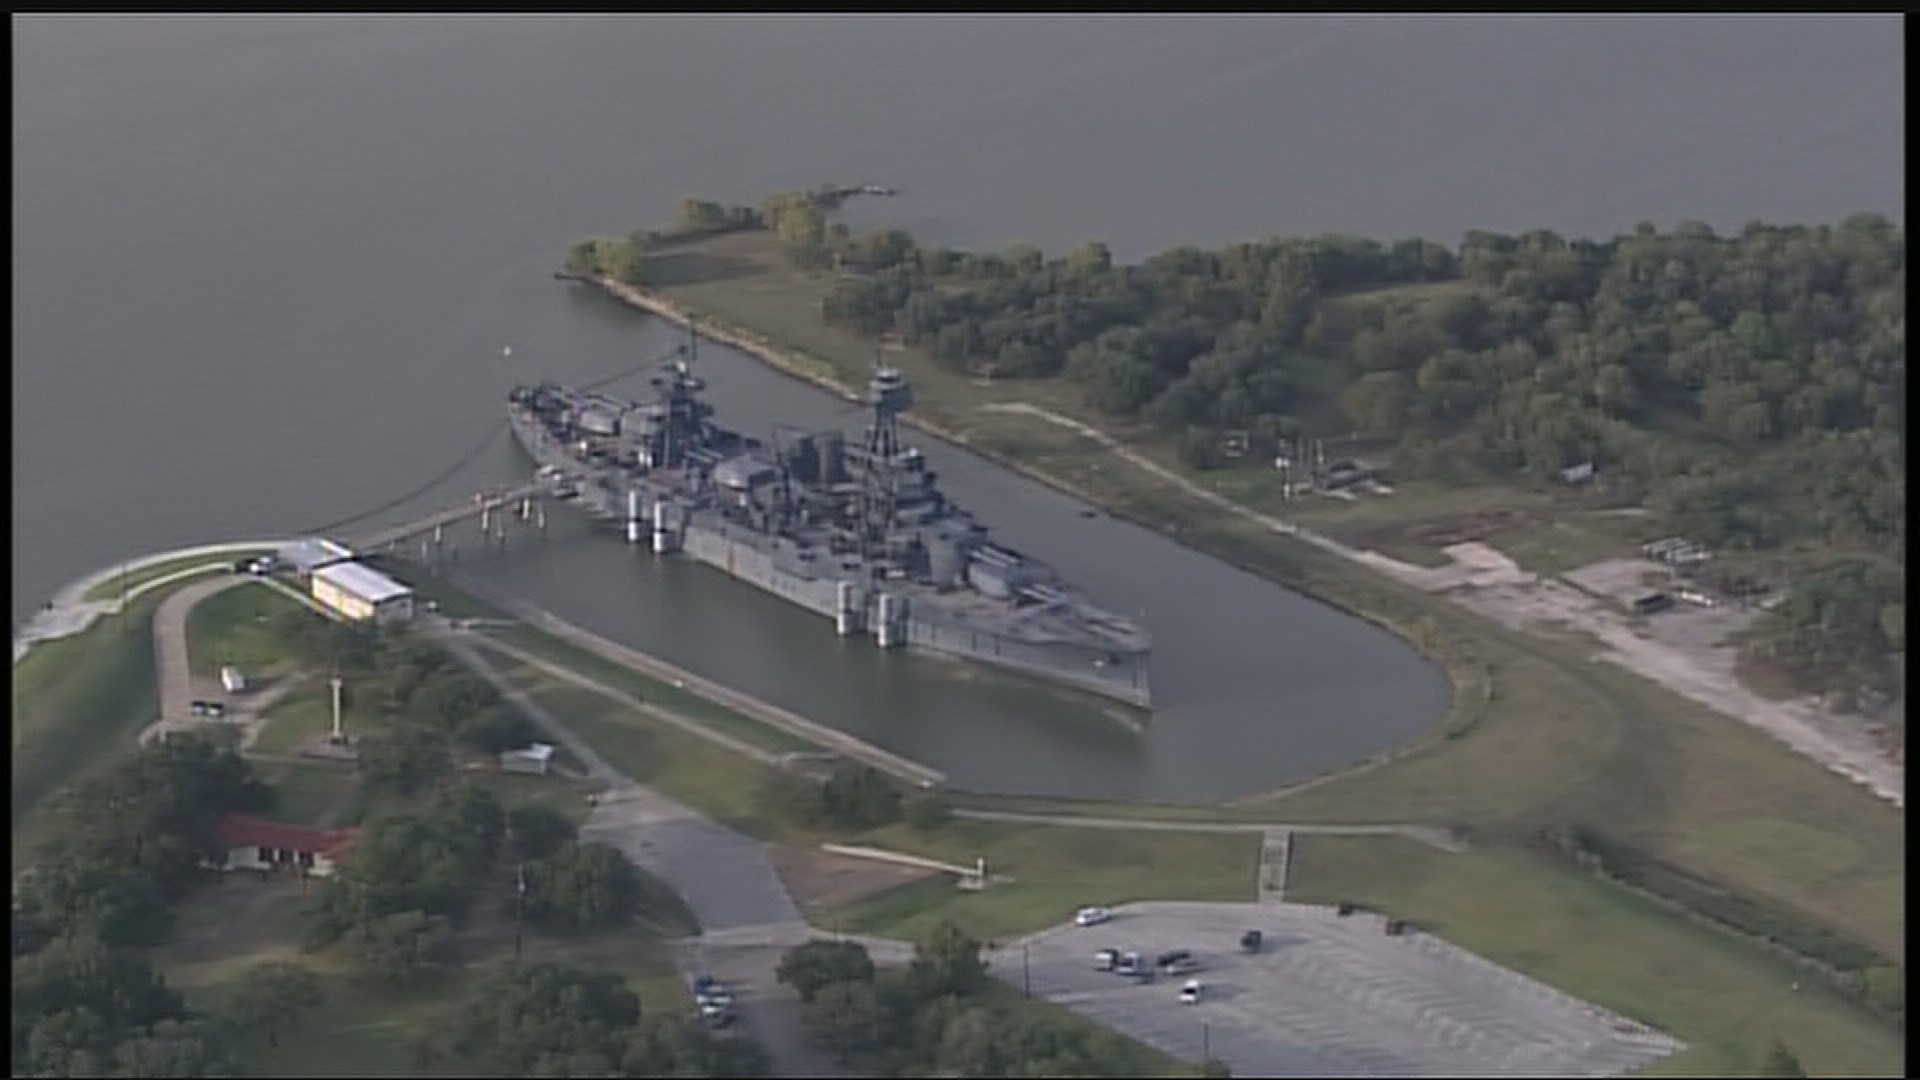 Battleship Texas to reopen Sunday after leak repairs | khou.com